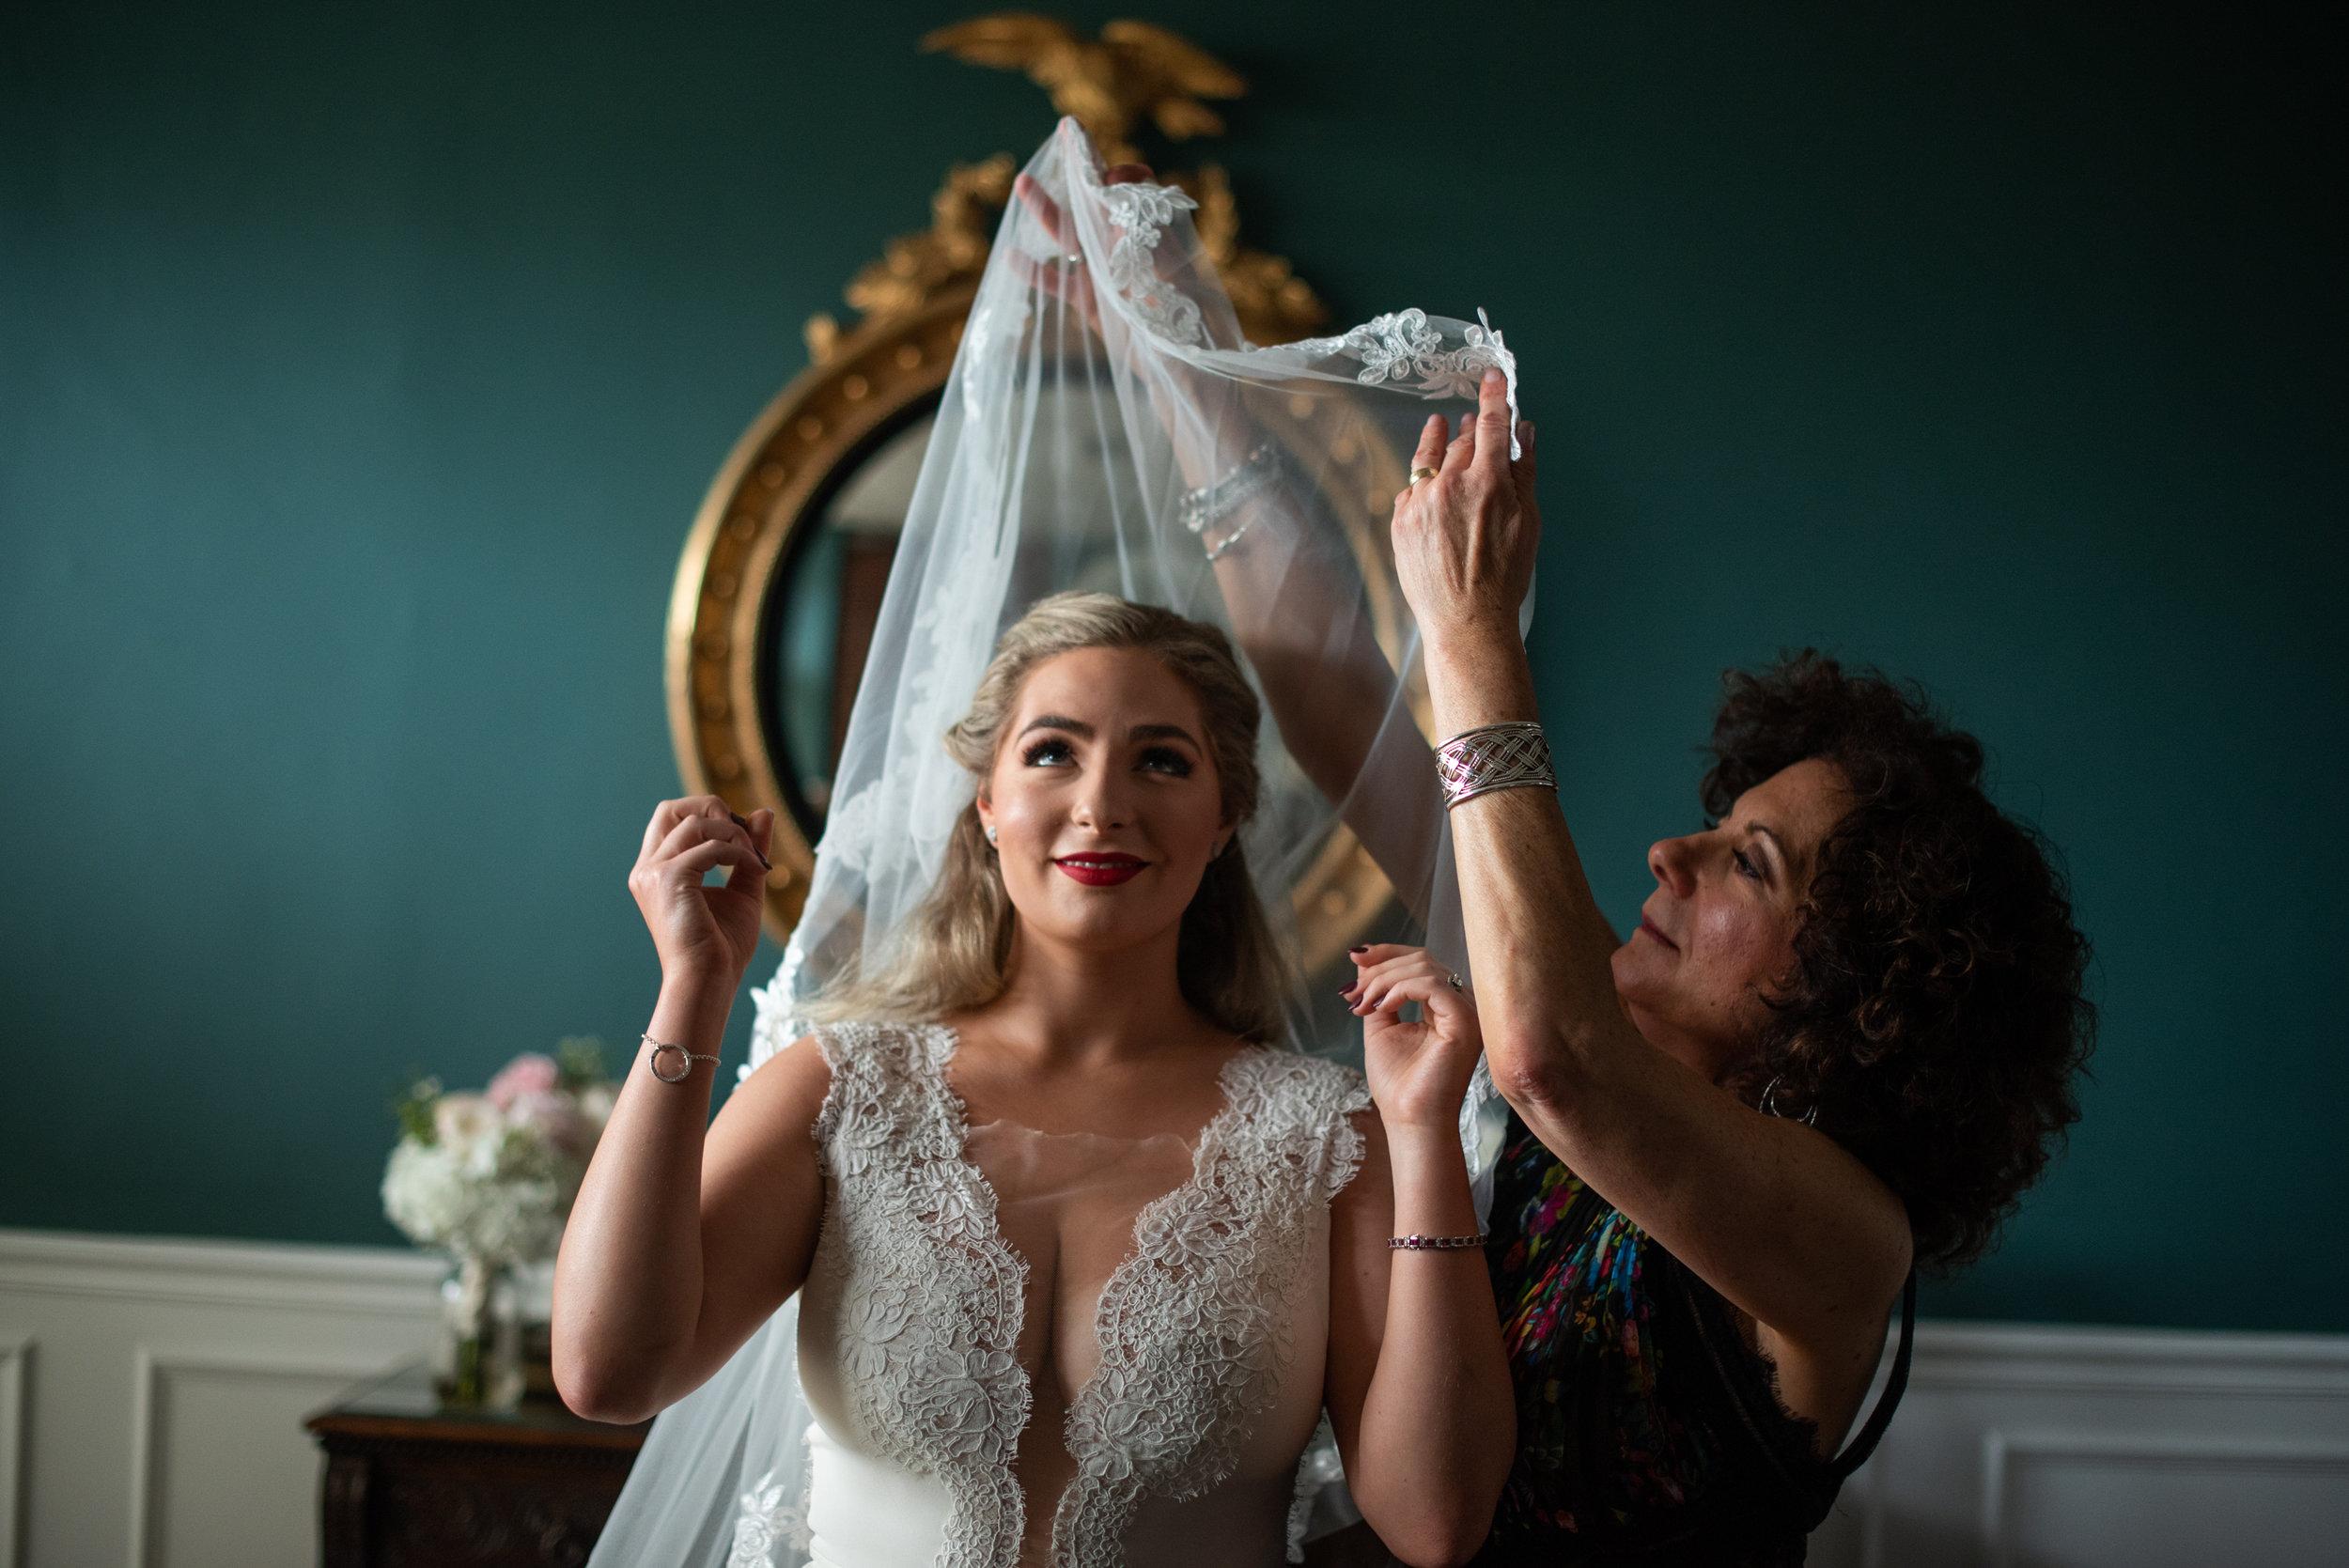 st-augustine-photographer-st-augustine-gay-wedding-sam-sex-wedding-photographer-sarah-annay-photography-white-room-weddings-20.jpg